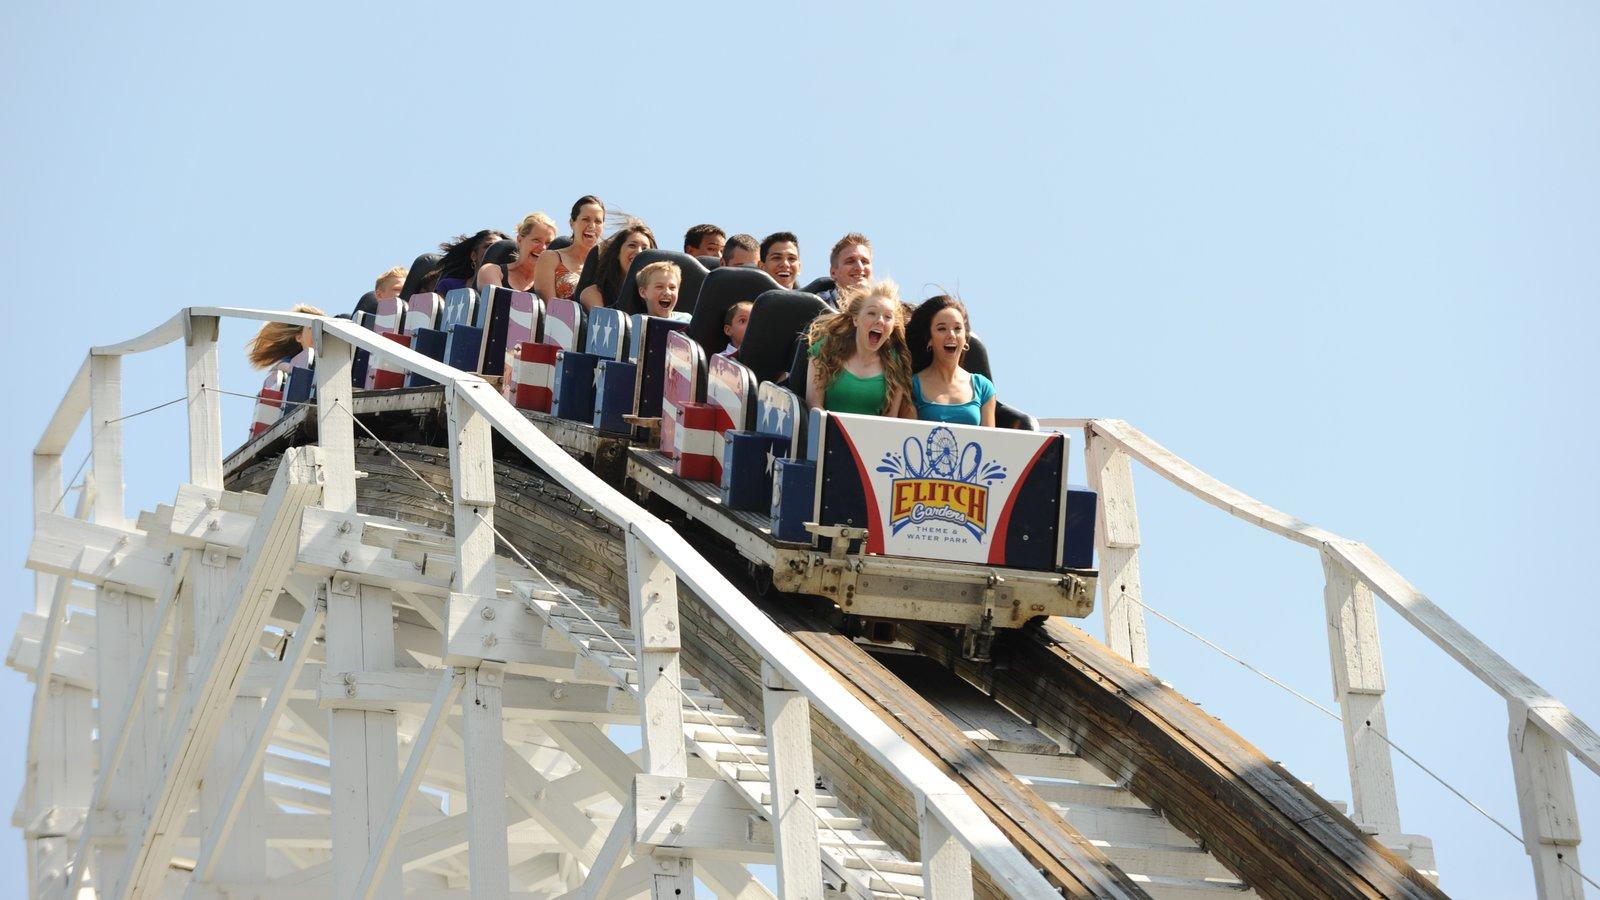 Elitch Gardens Theme Park que inclui passeios